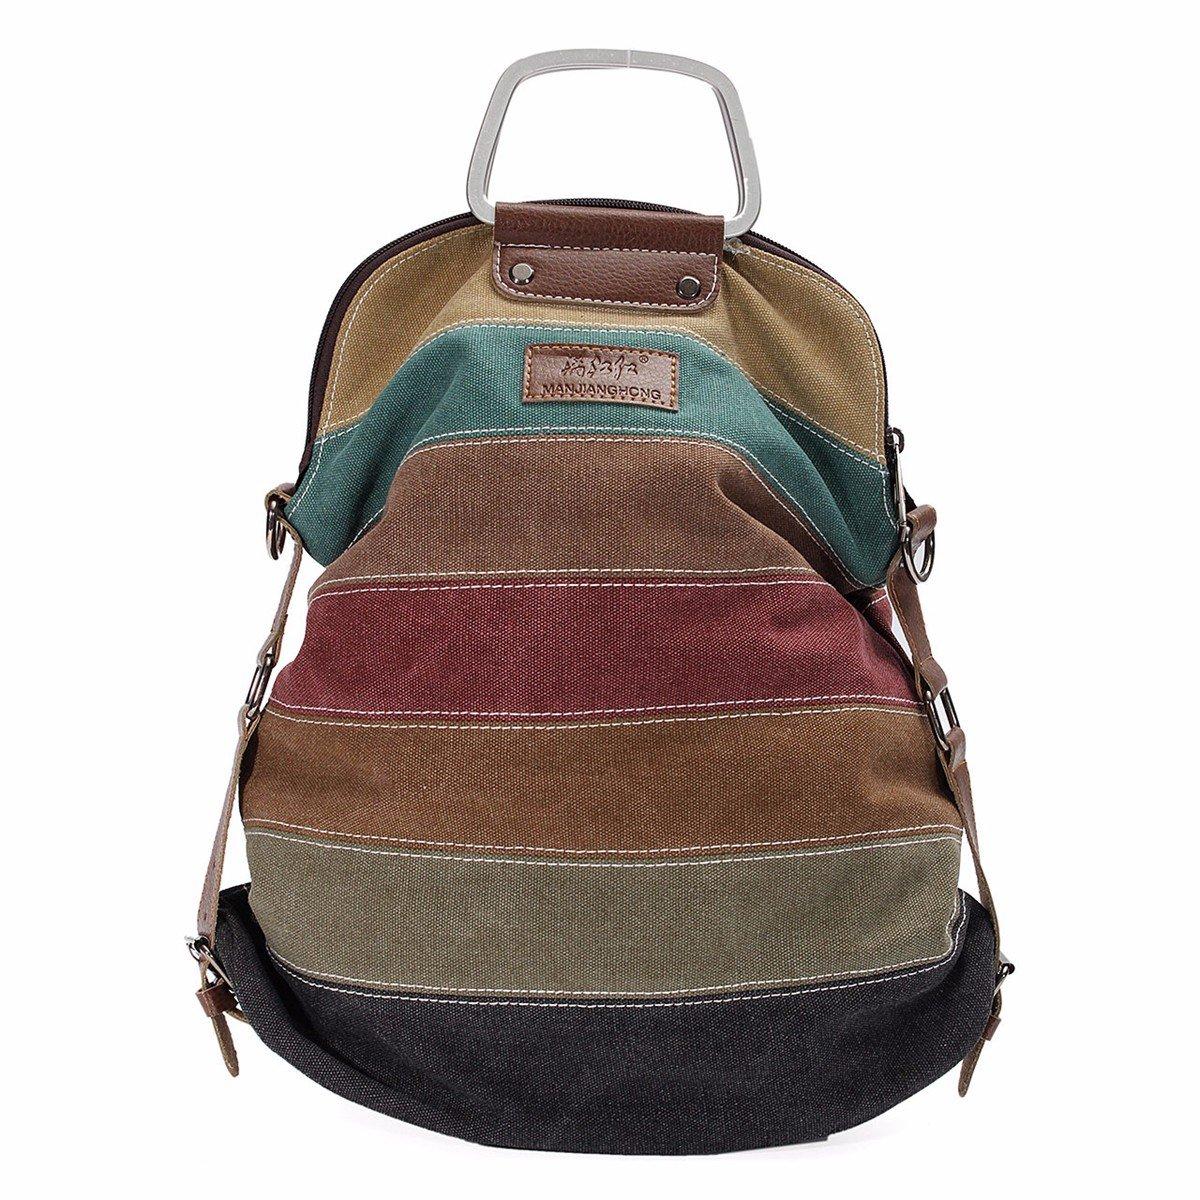 OURBAG Canvas Backpack Multi-function Shoulder Bag Handbag Striped Large Tote Bags Colorful